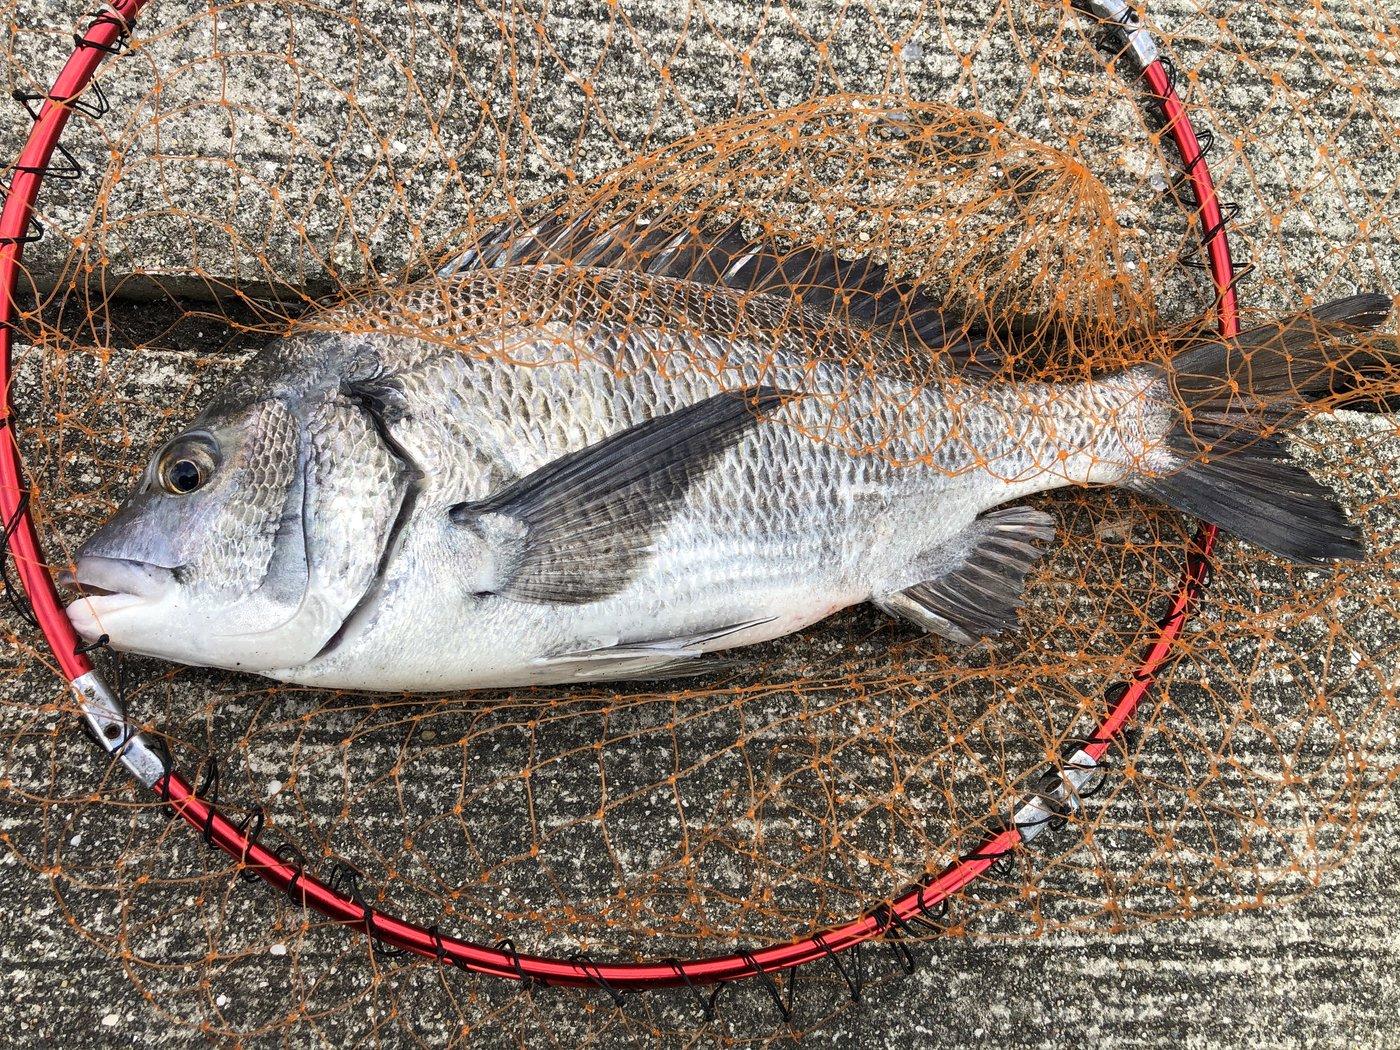 kiiysd13さんの投稿画像,写っている魚はクロダイ